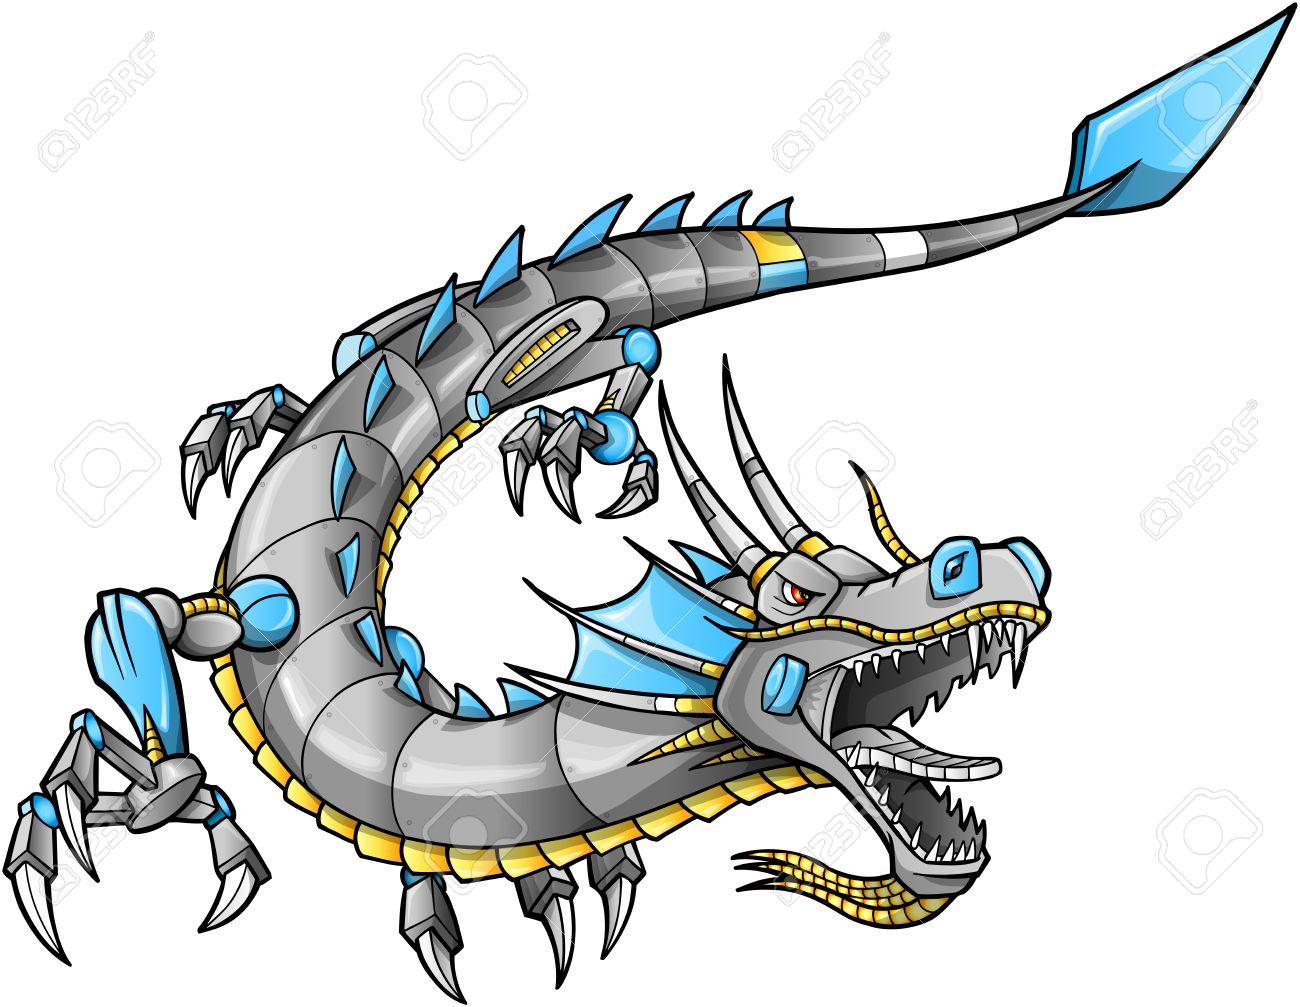 robot cyborg dragon vector illustration art royalty free cliparts